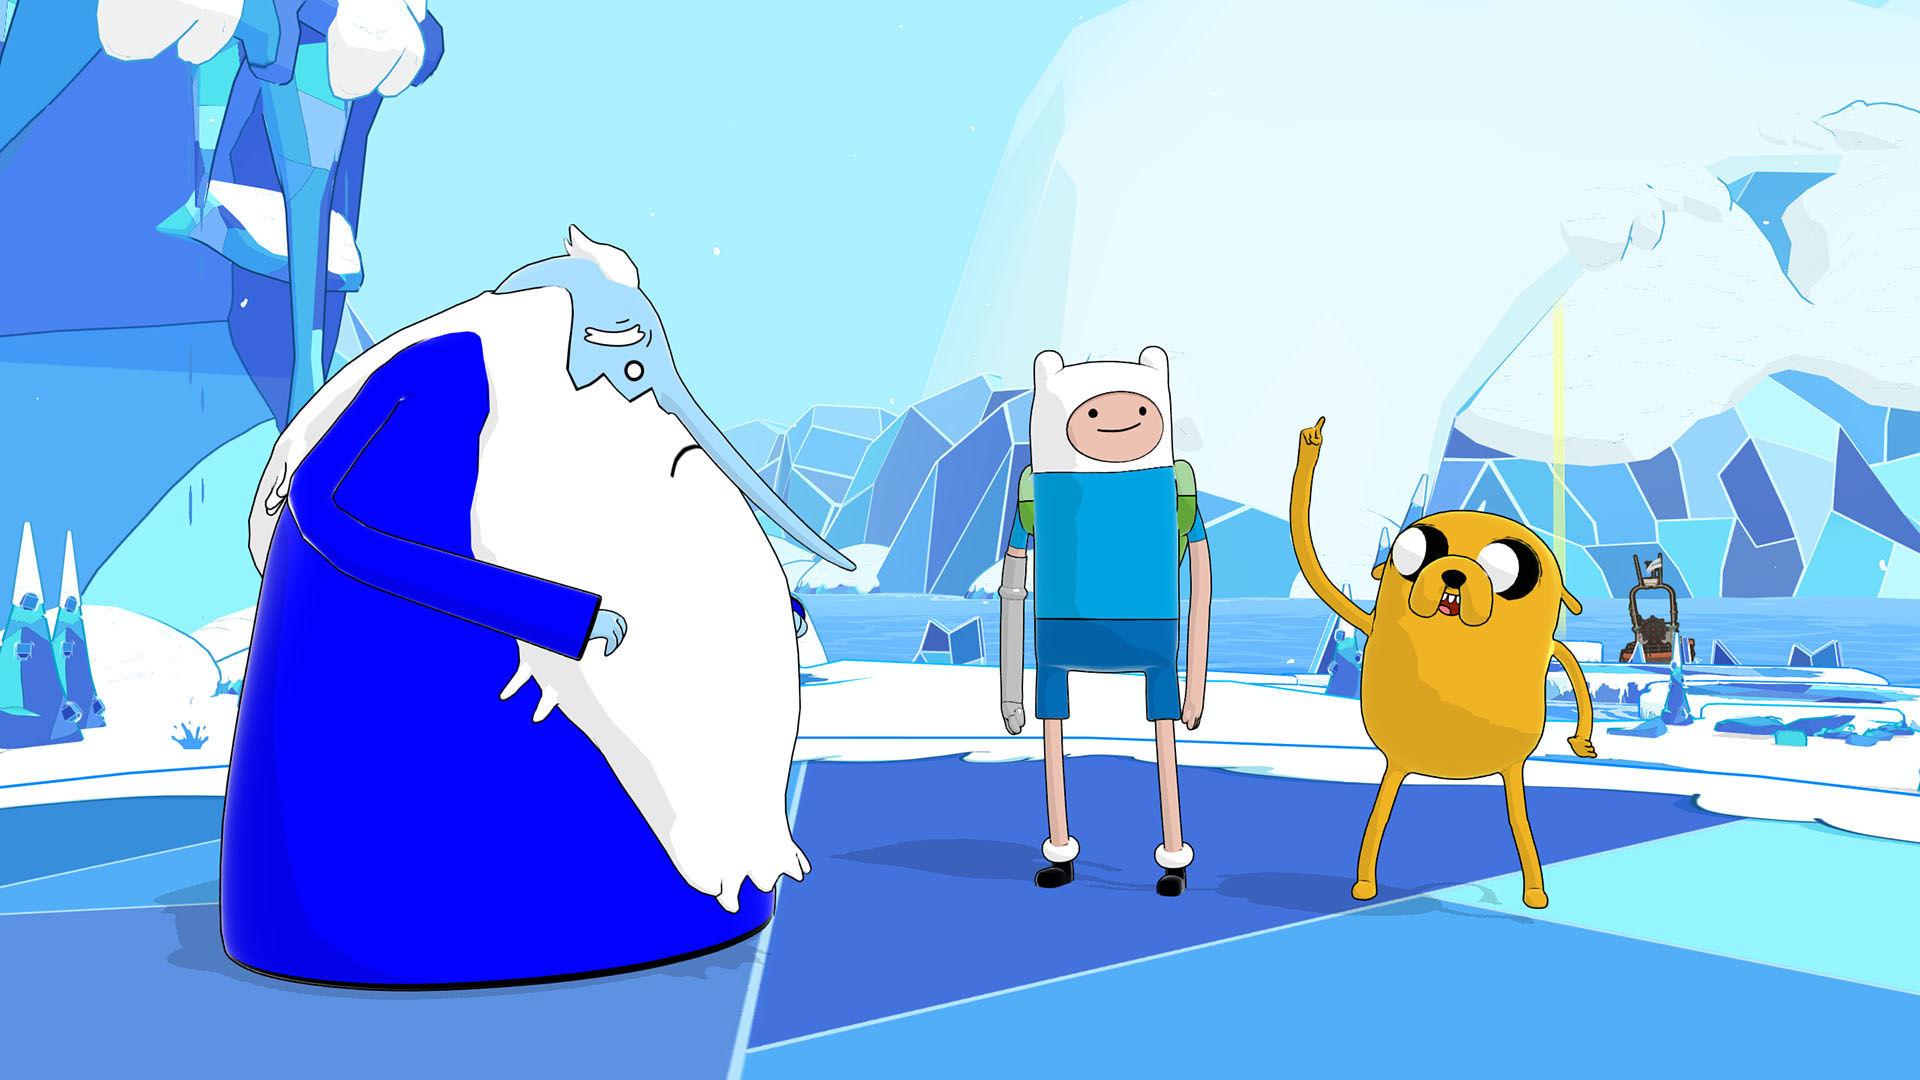 Vi har lirat Adventure Time: Pirates of the Enchiridion